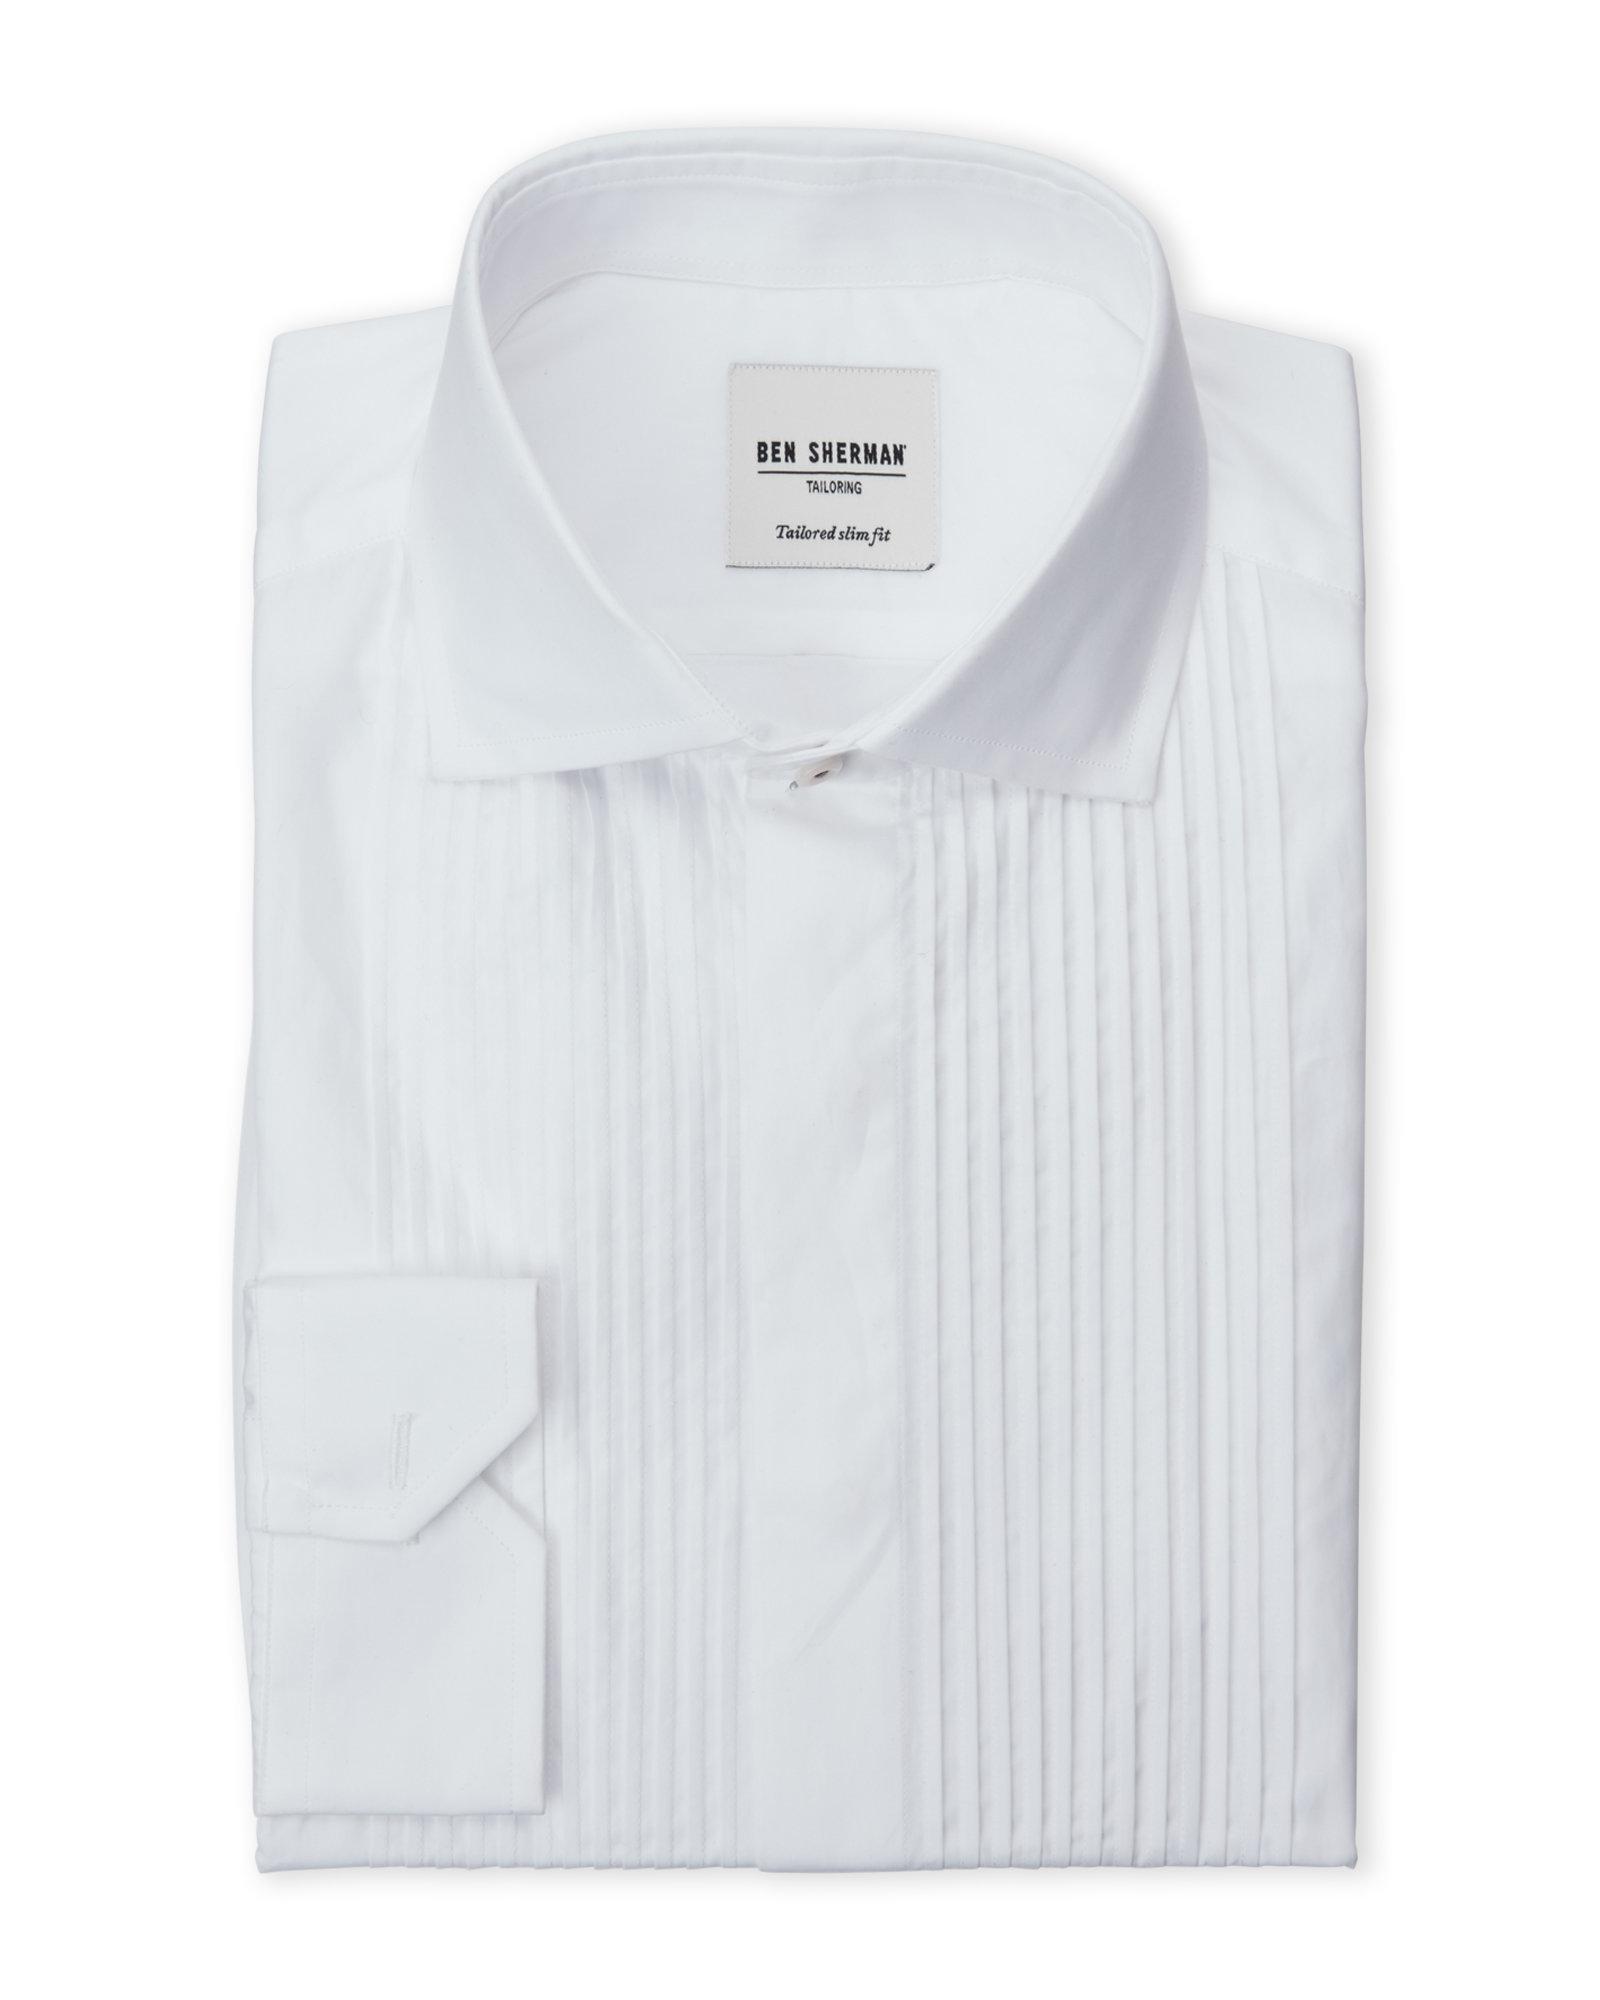 Lyst Ben Sherman French Cuffs Tuxedo Dress Shirt In White For Men